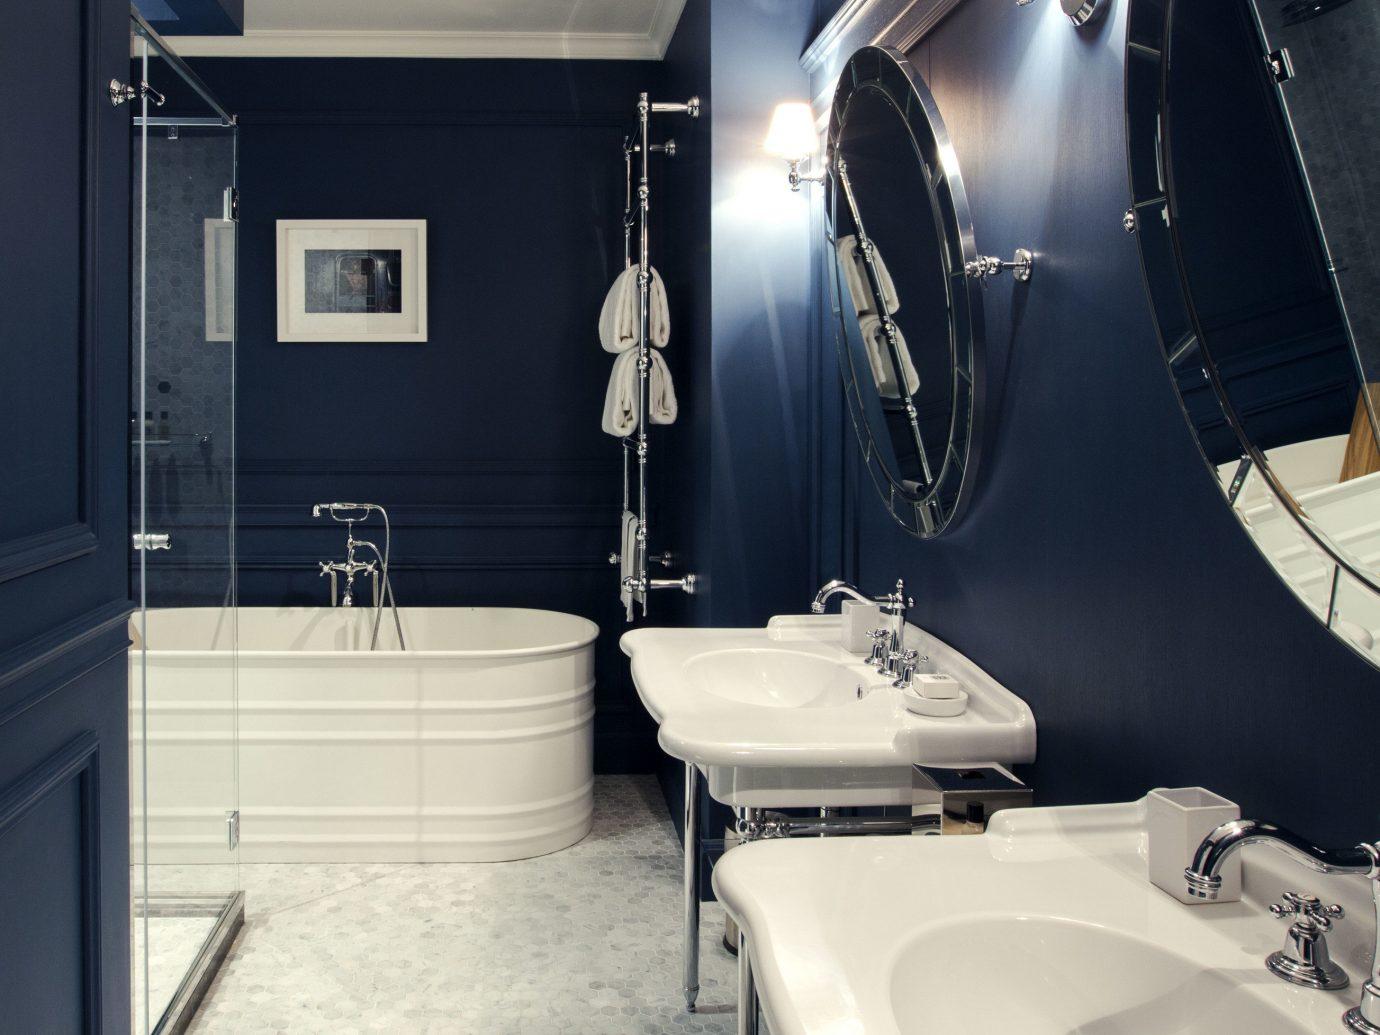 Boutique Hotels Hotels indoor bathroom wall room toilet sink plumbing fixture public toilet interior design bathtub tile tiled